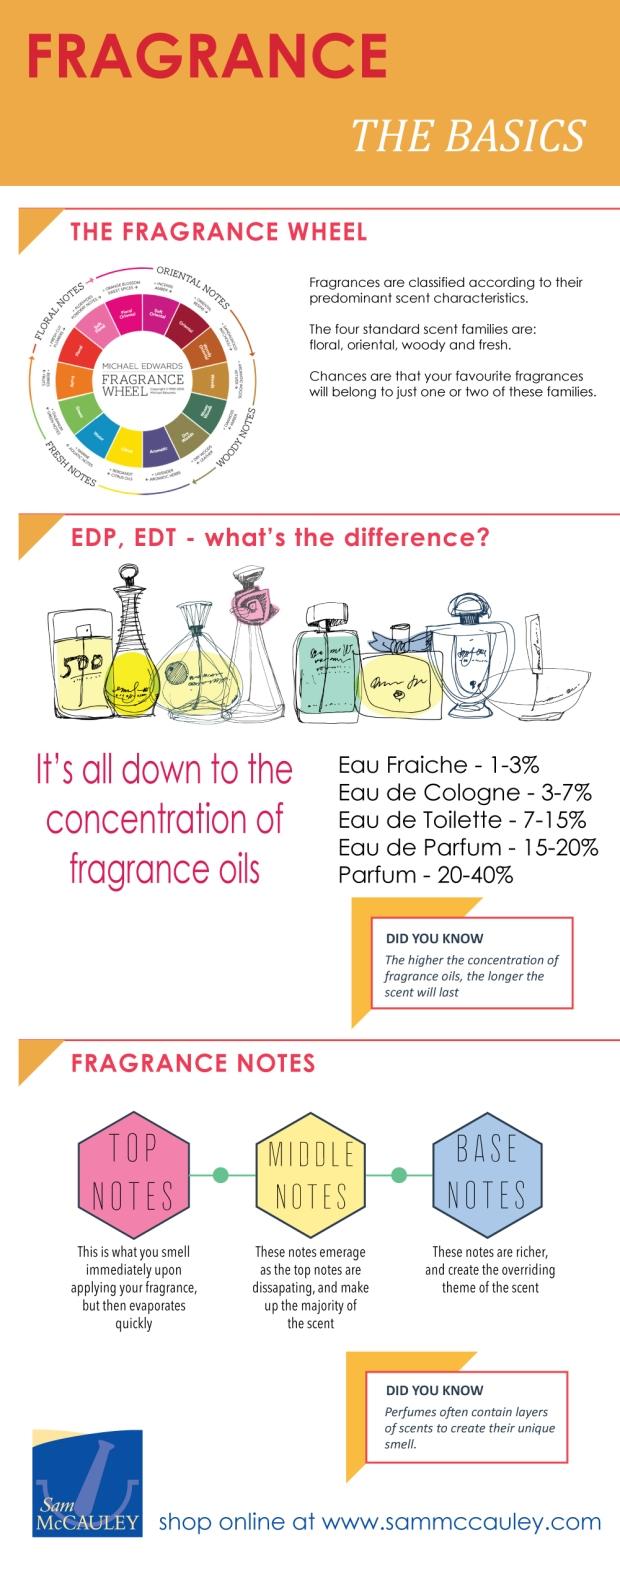 Fragrance - The Basics Infographic